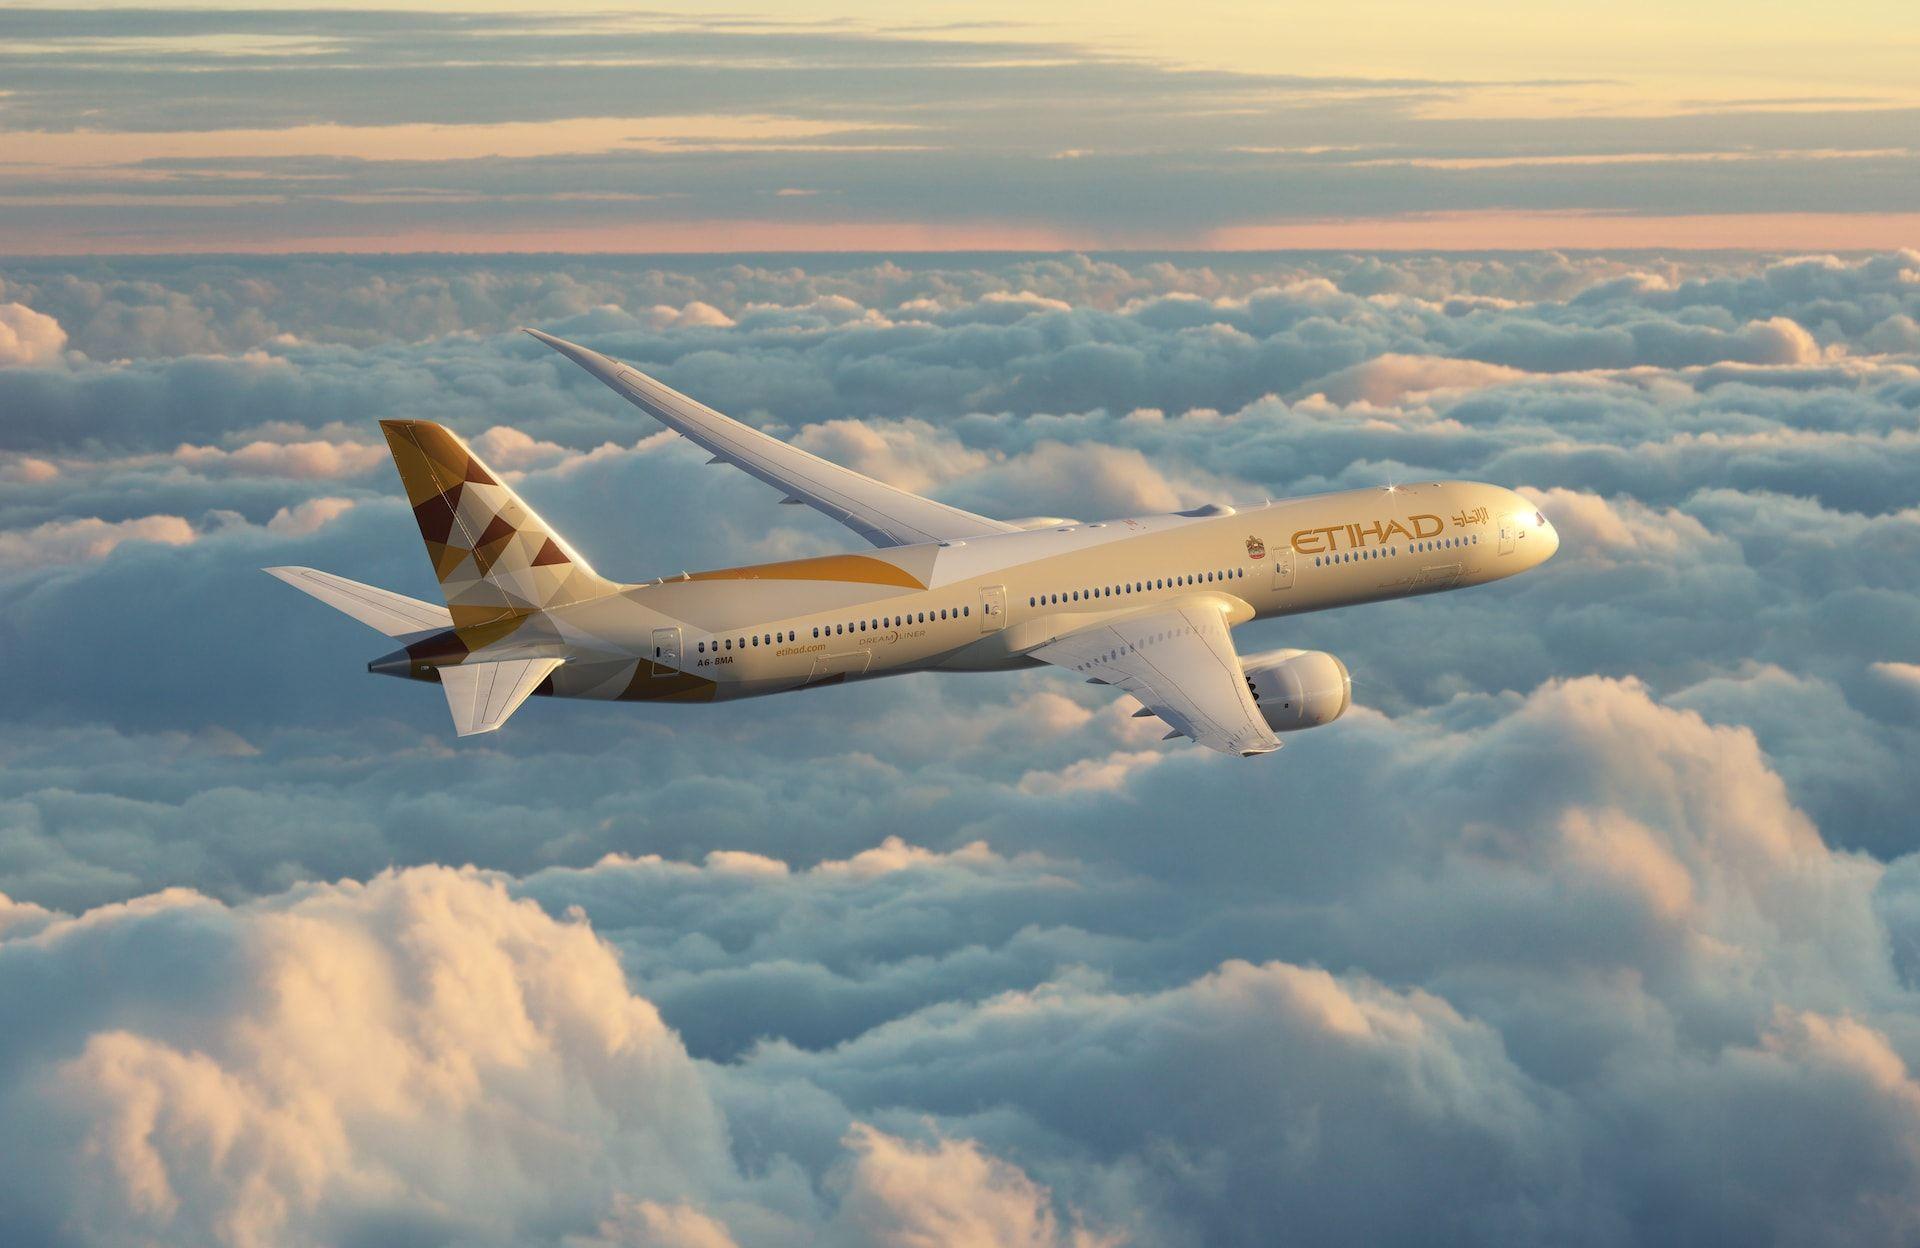 Etihad Airways announces new route to Israel